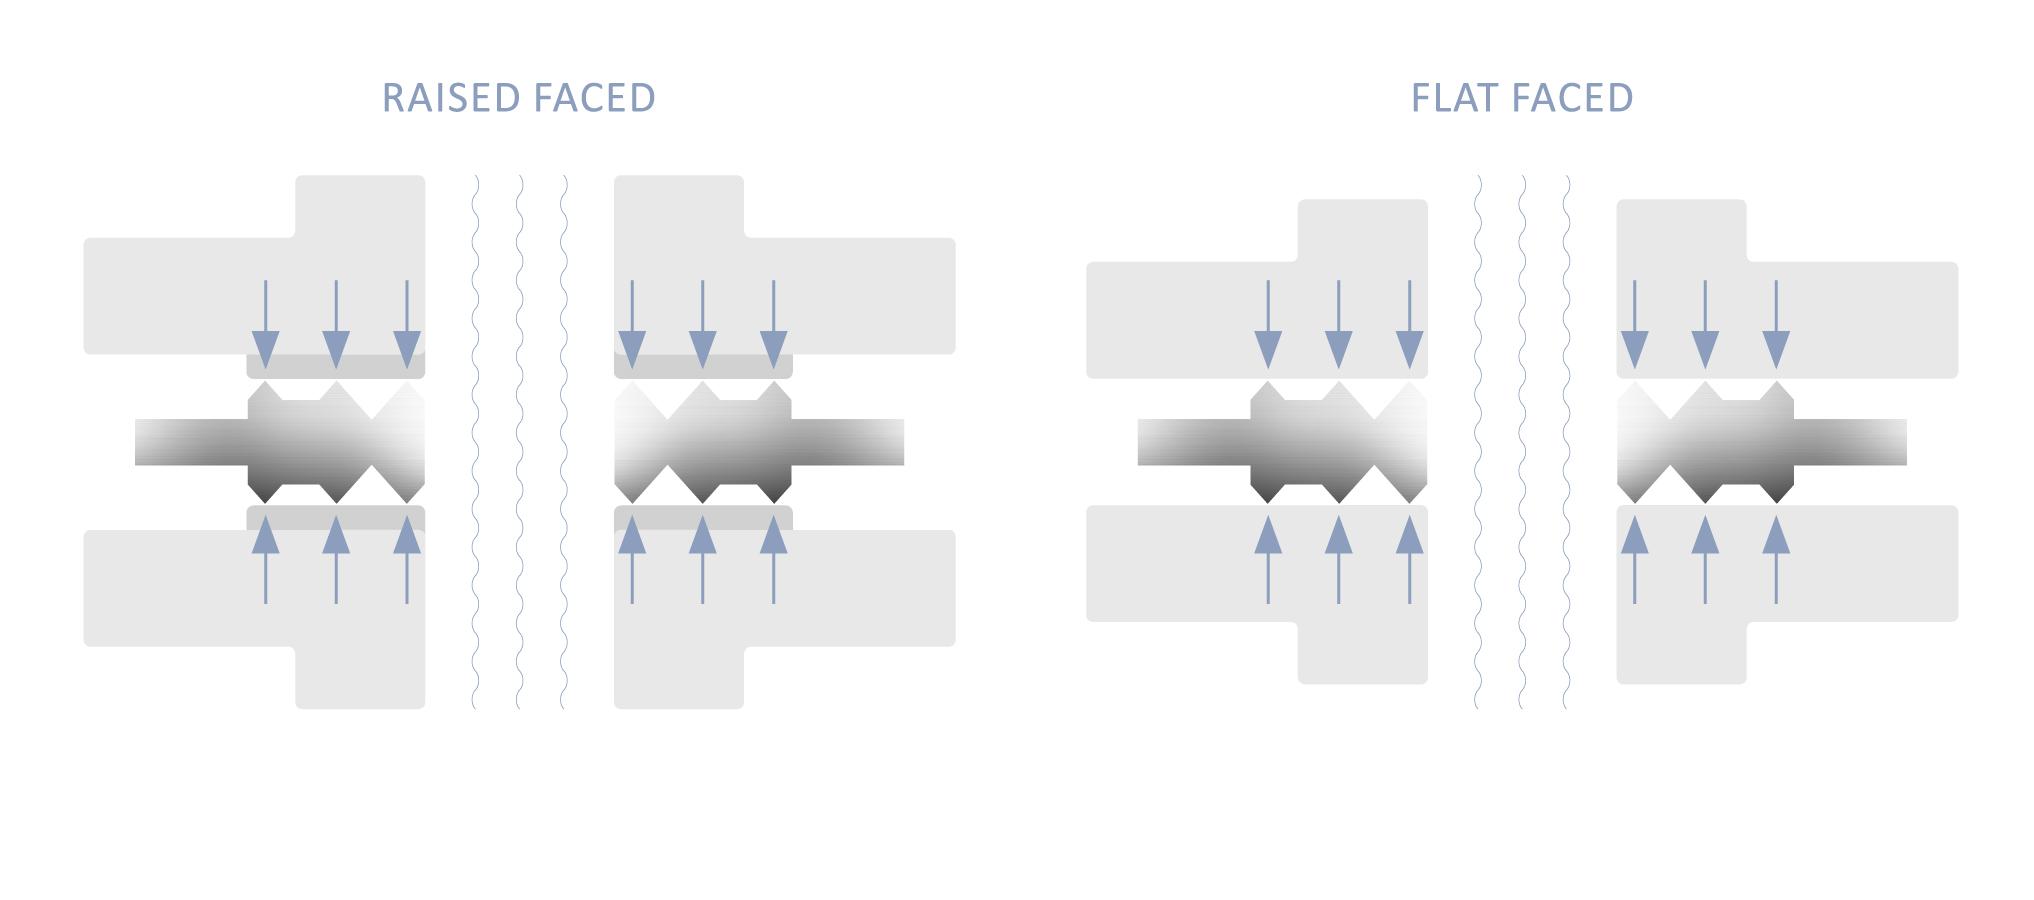 The-solution-raised-faced-flat-faced.jpg